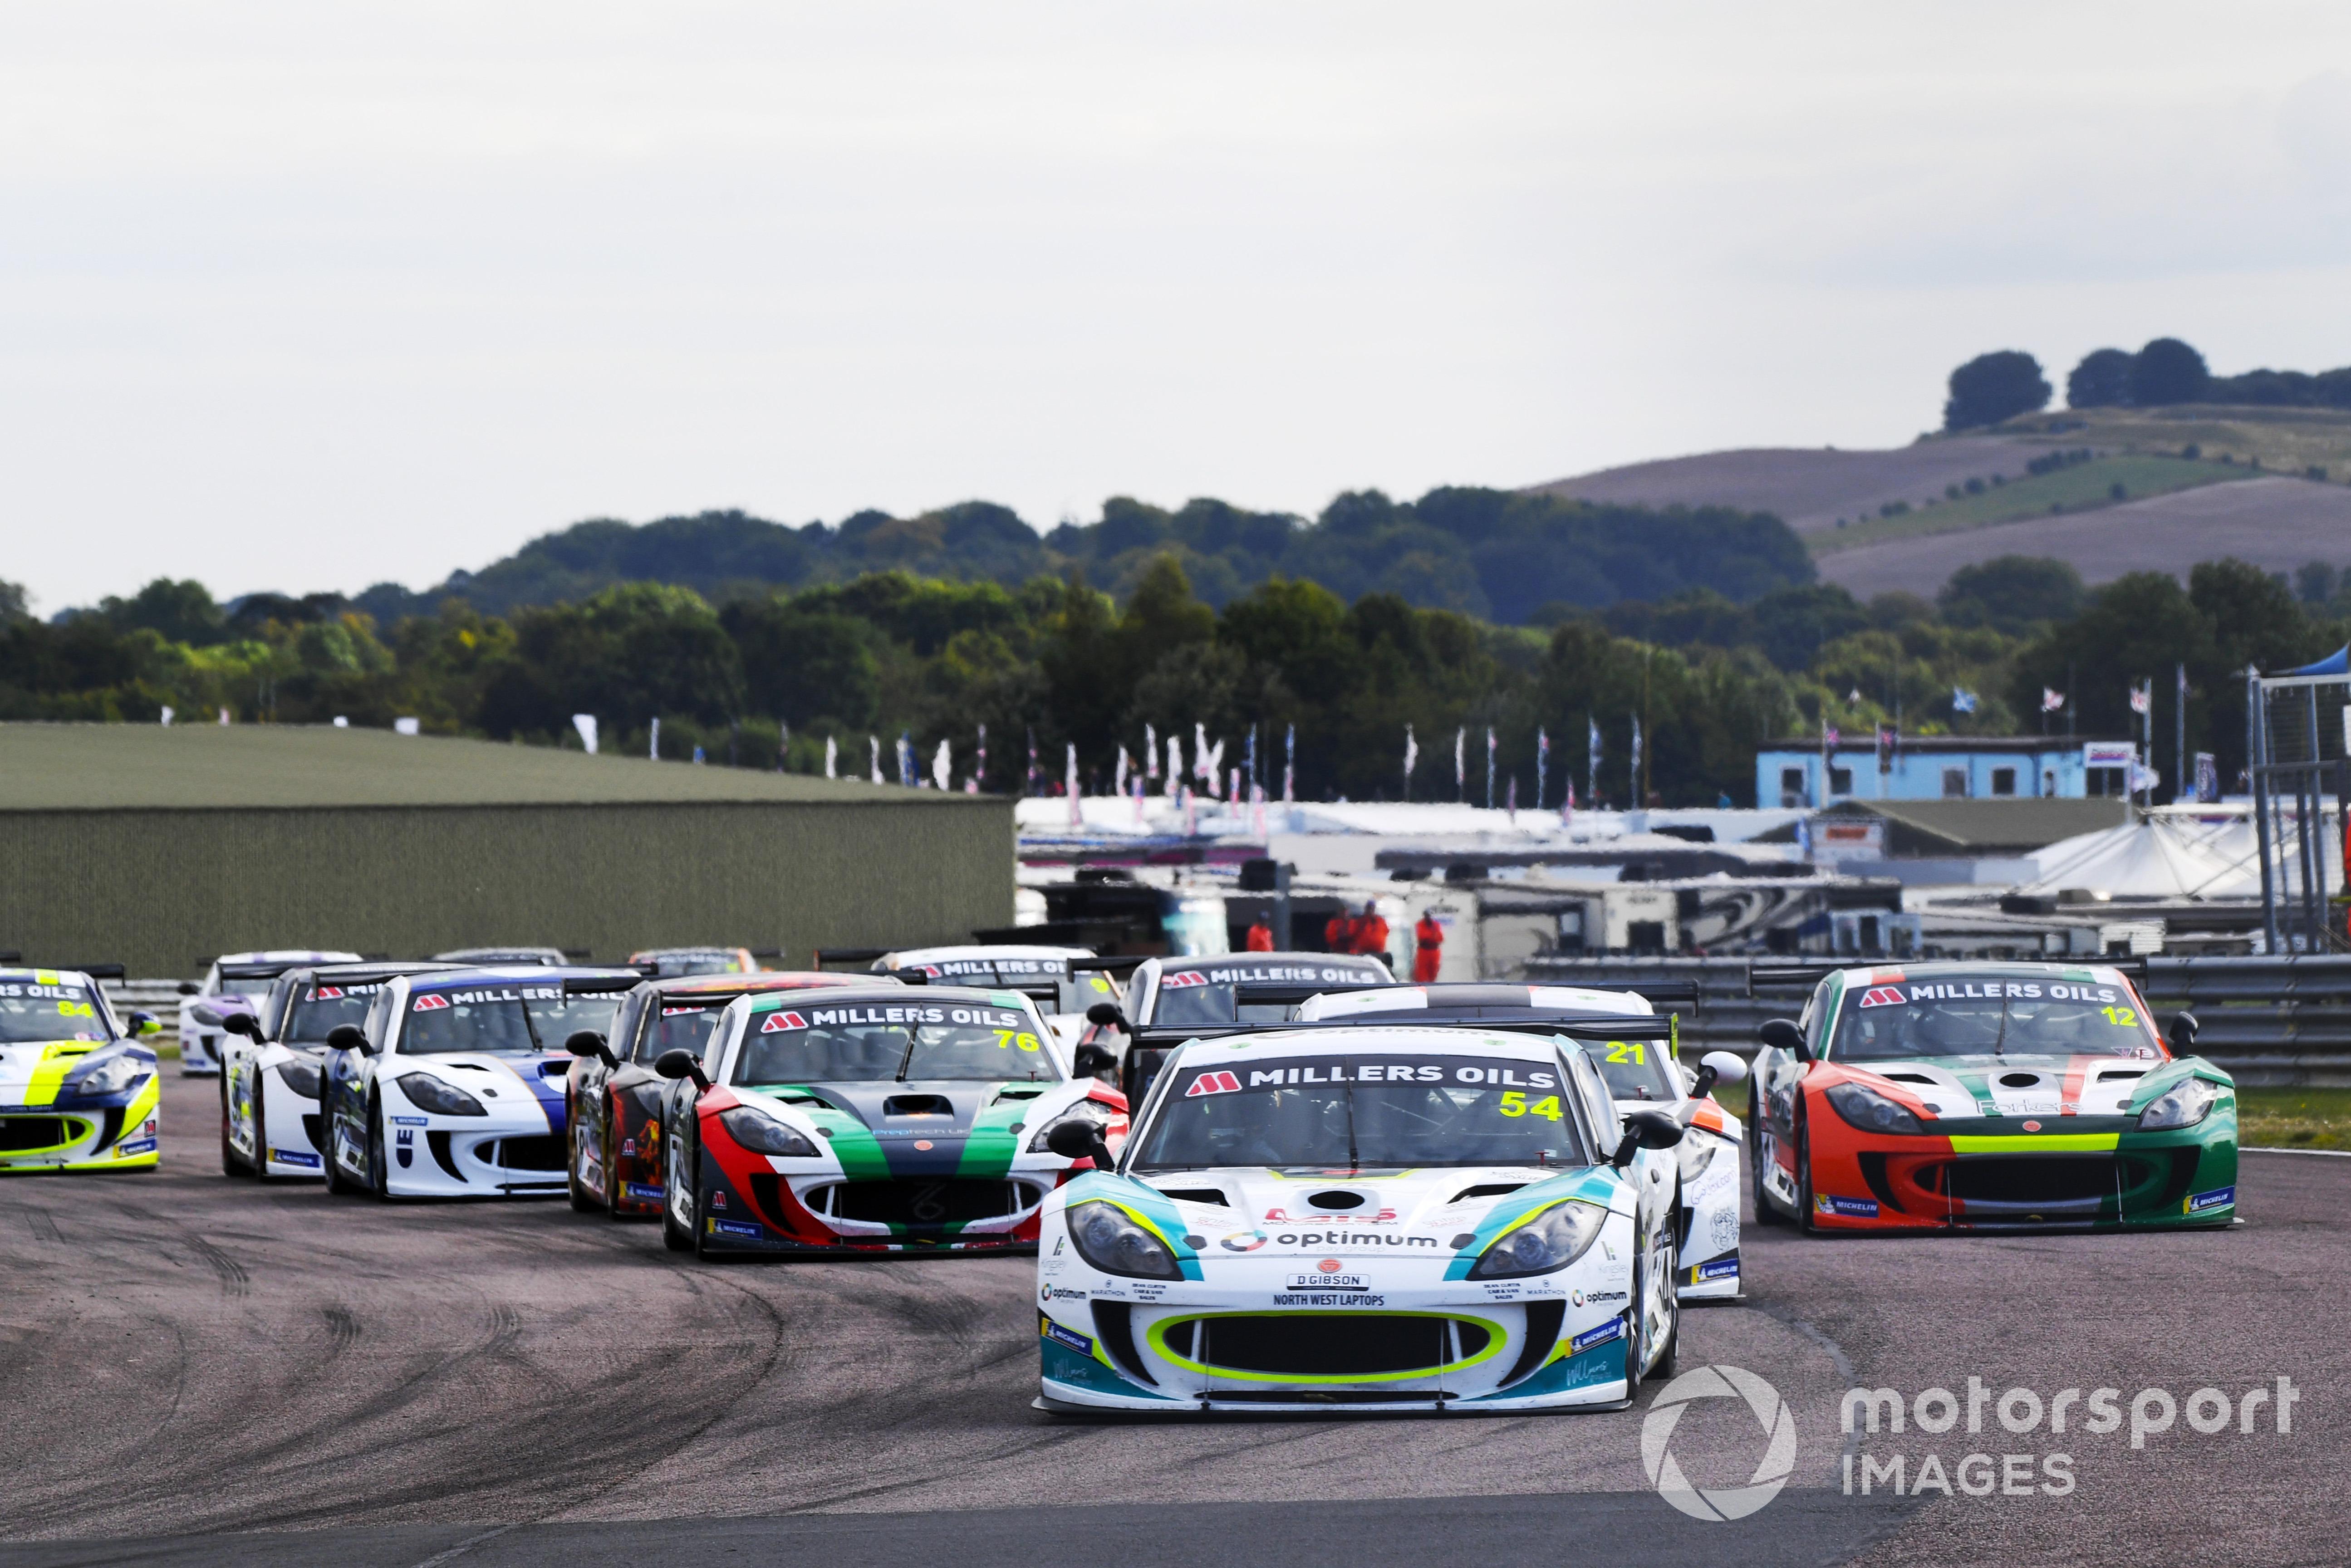 Adam Smalley, Ginetta GT4 Supercup, Thruxton 2021